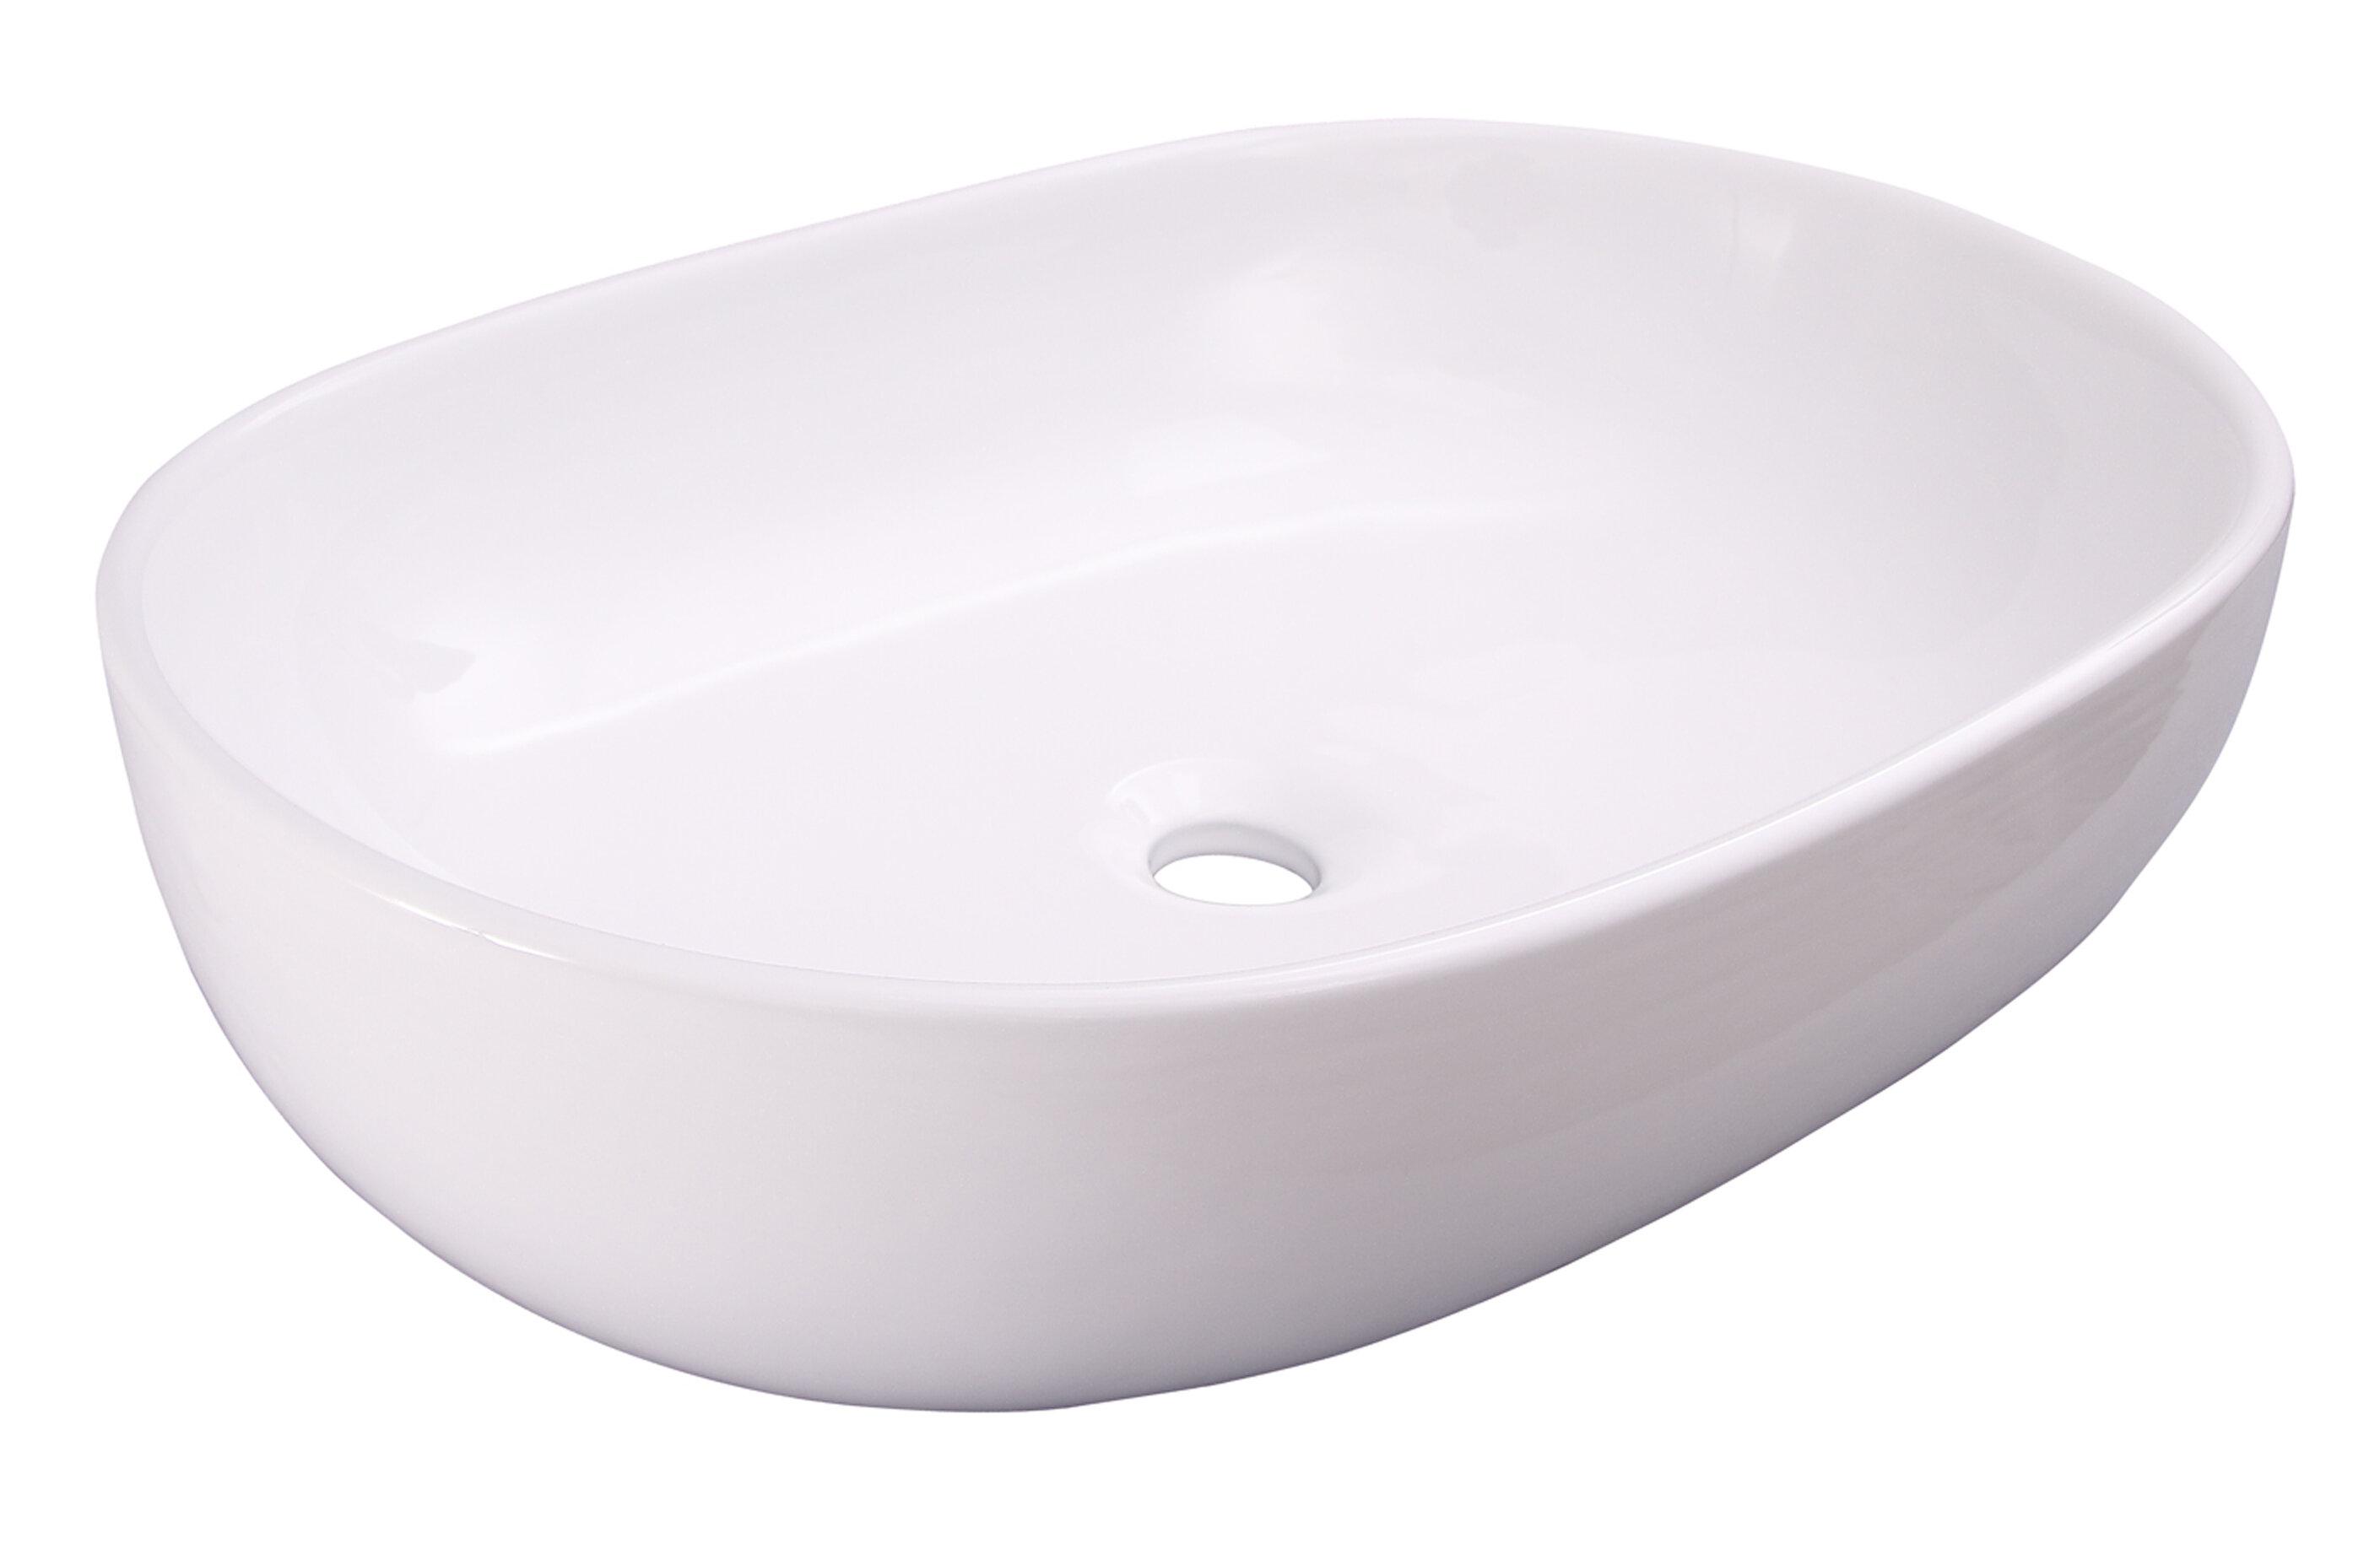 Barclay Kesha Vitreous China Oval Vessel Bathroom Sink Wayfair